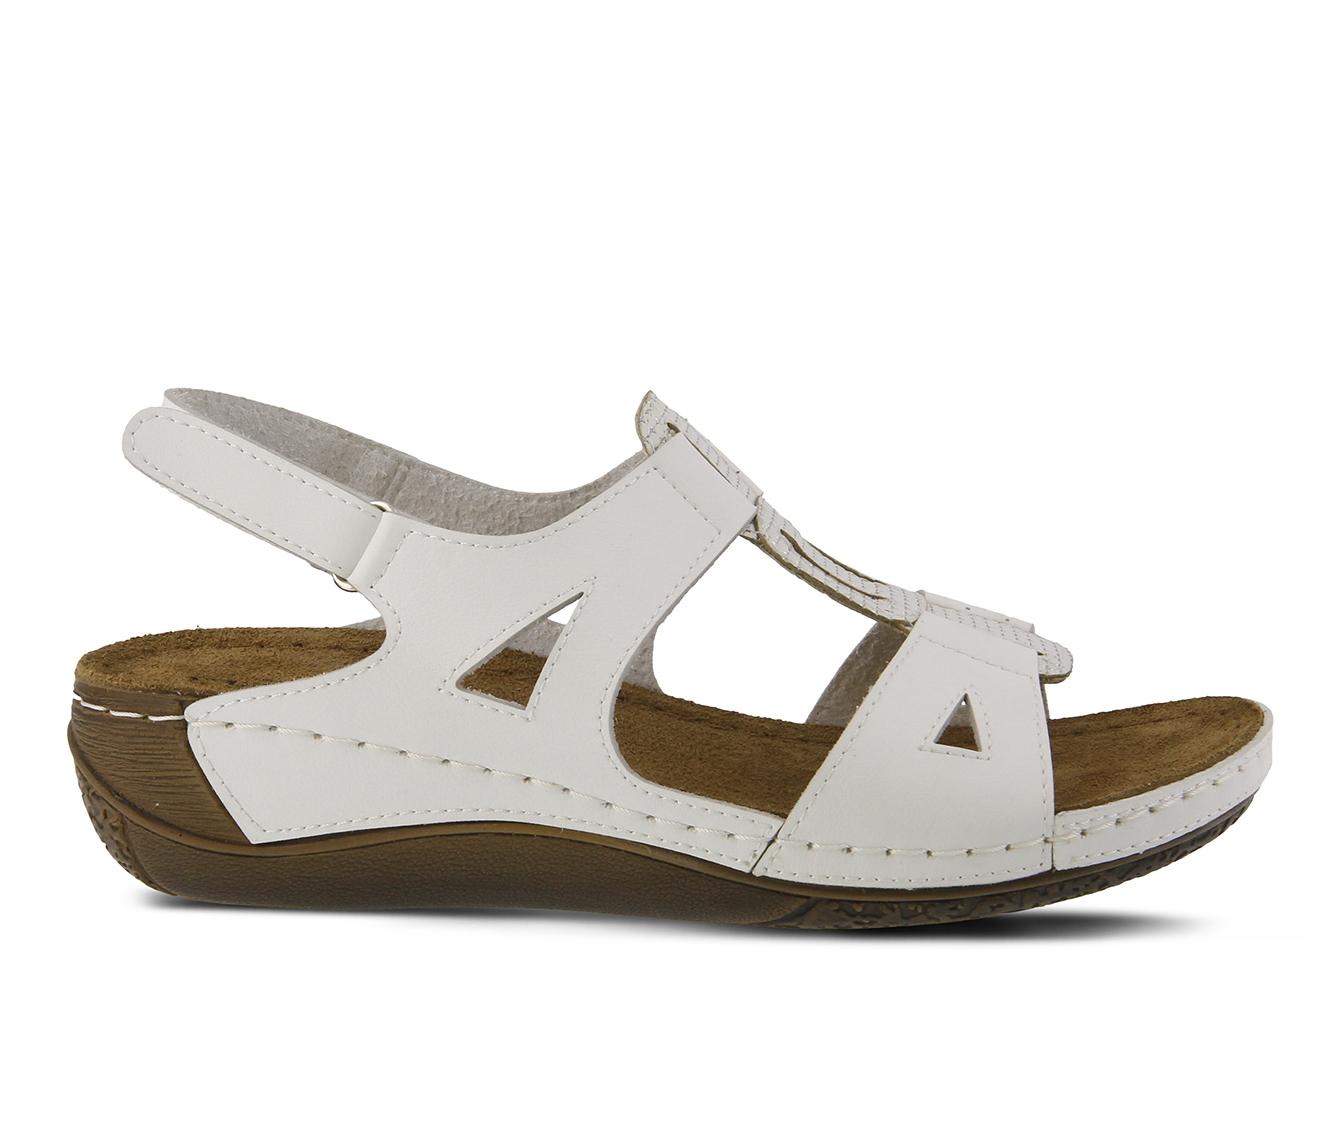 Flexus Naxos Women's Sandal (White Faux Leather)